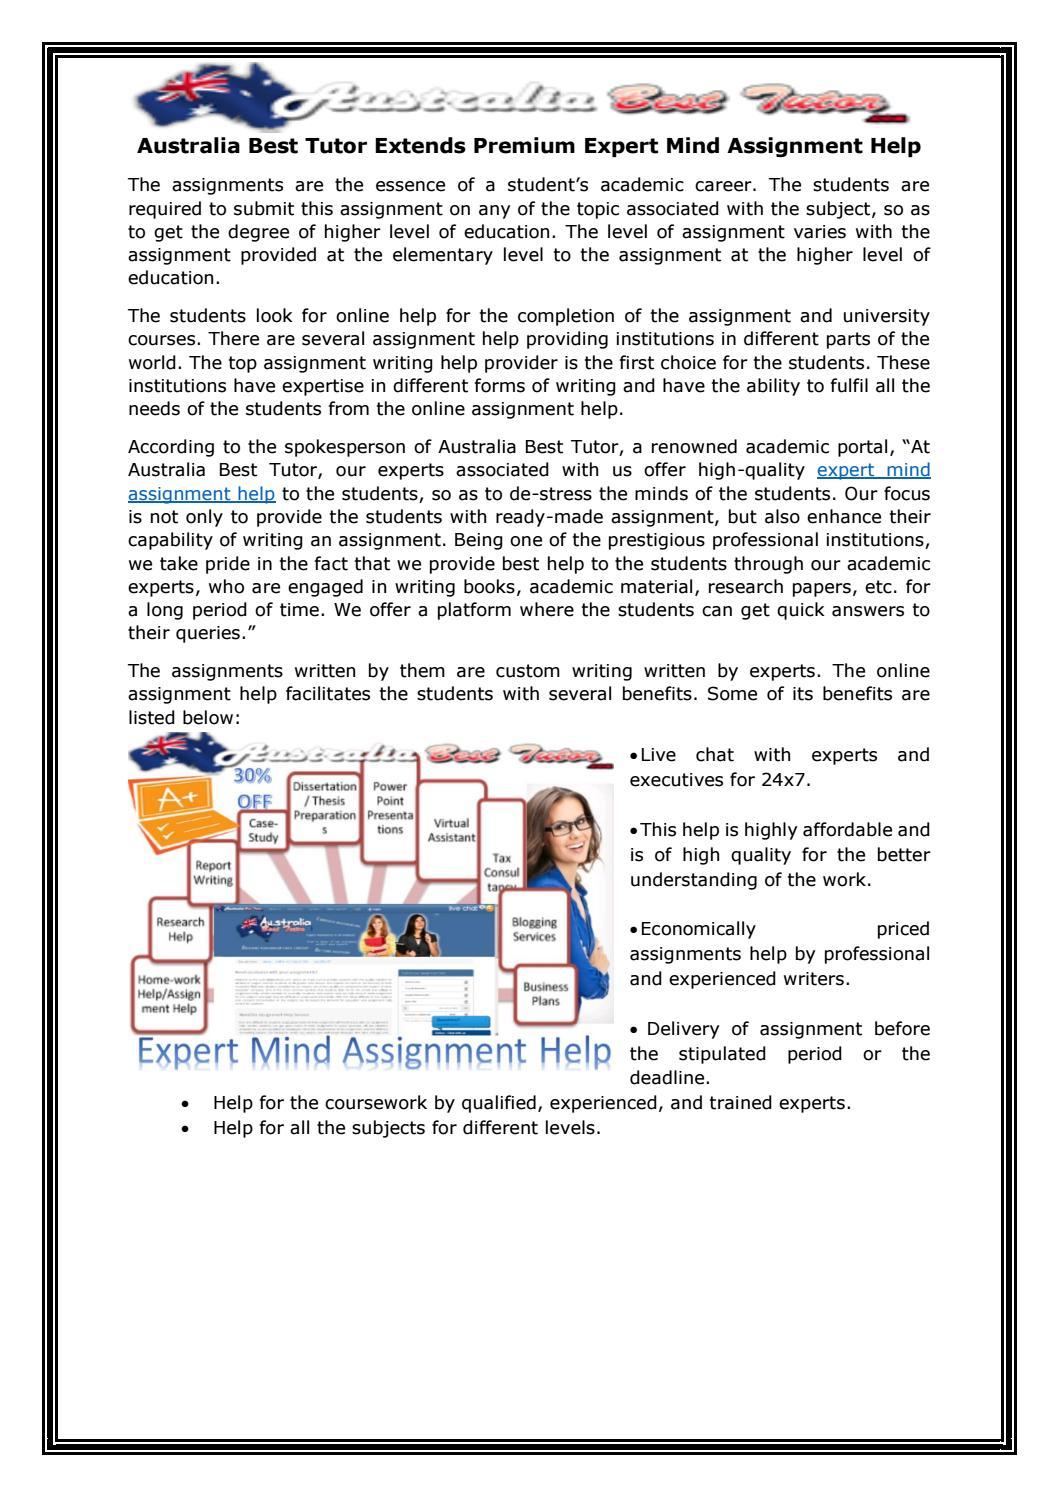 Online assignment help australia